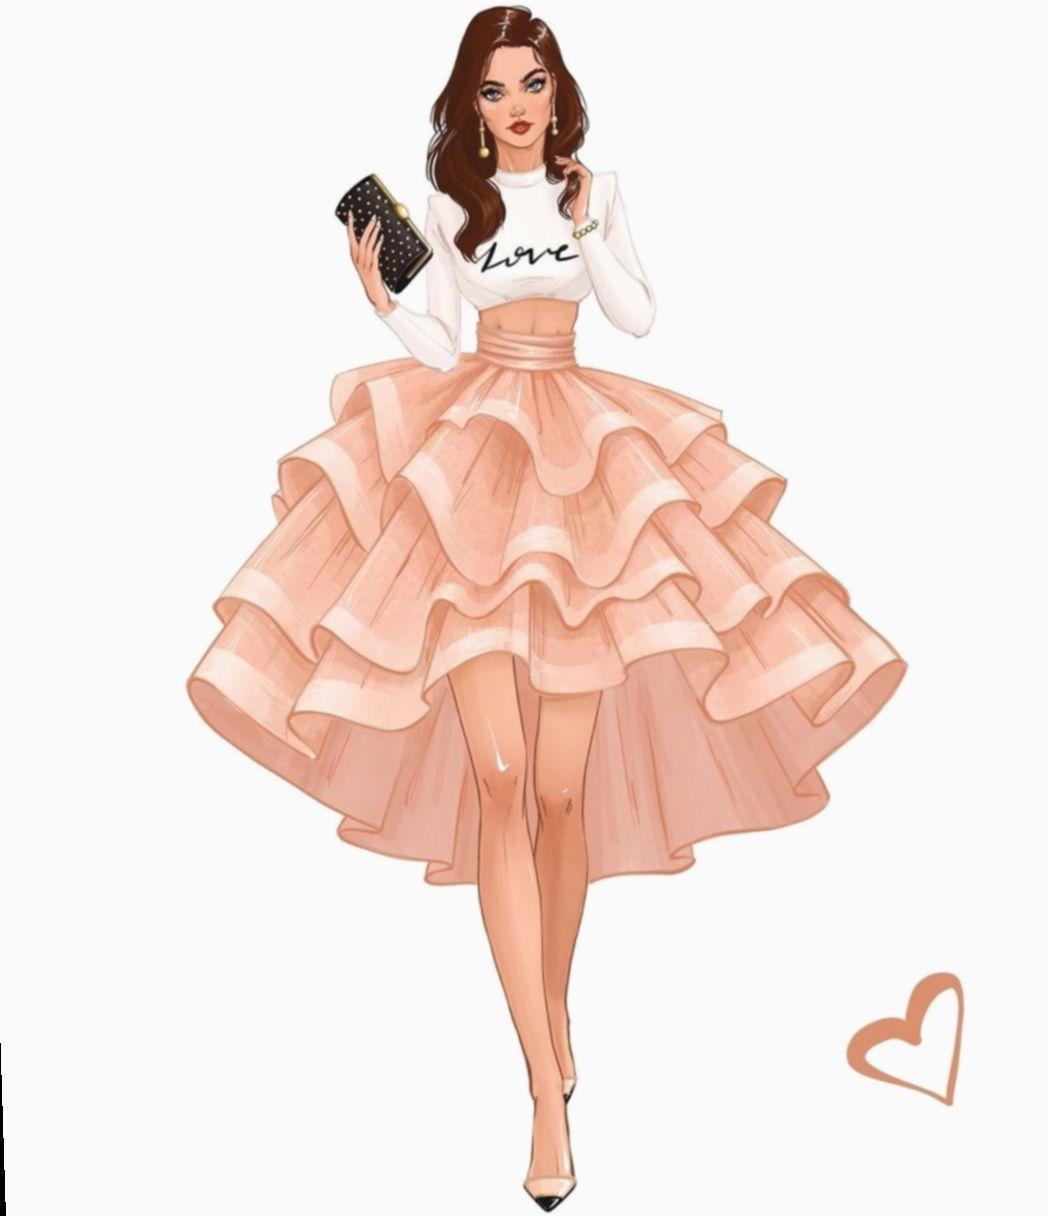 21 Fashion Drawing Ideas Clothing Fashion Illustration Sketches Dresses Dress Design Drawing Illustration Fashion Design